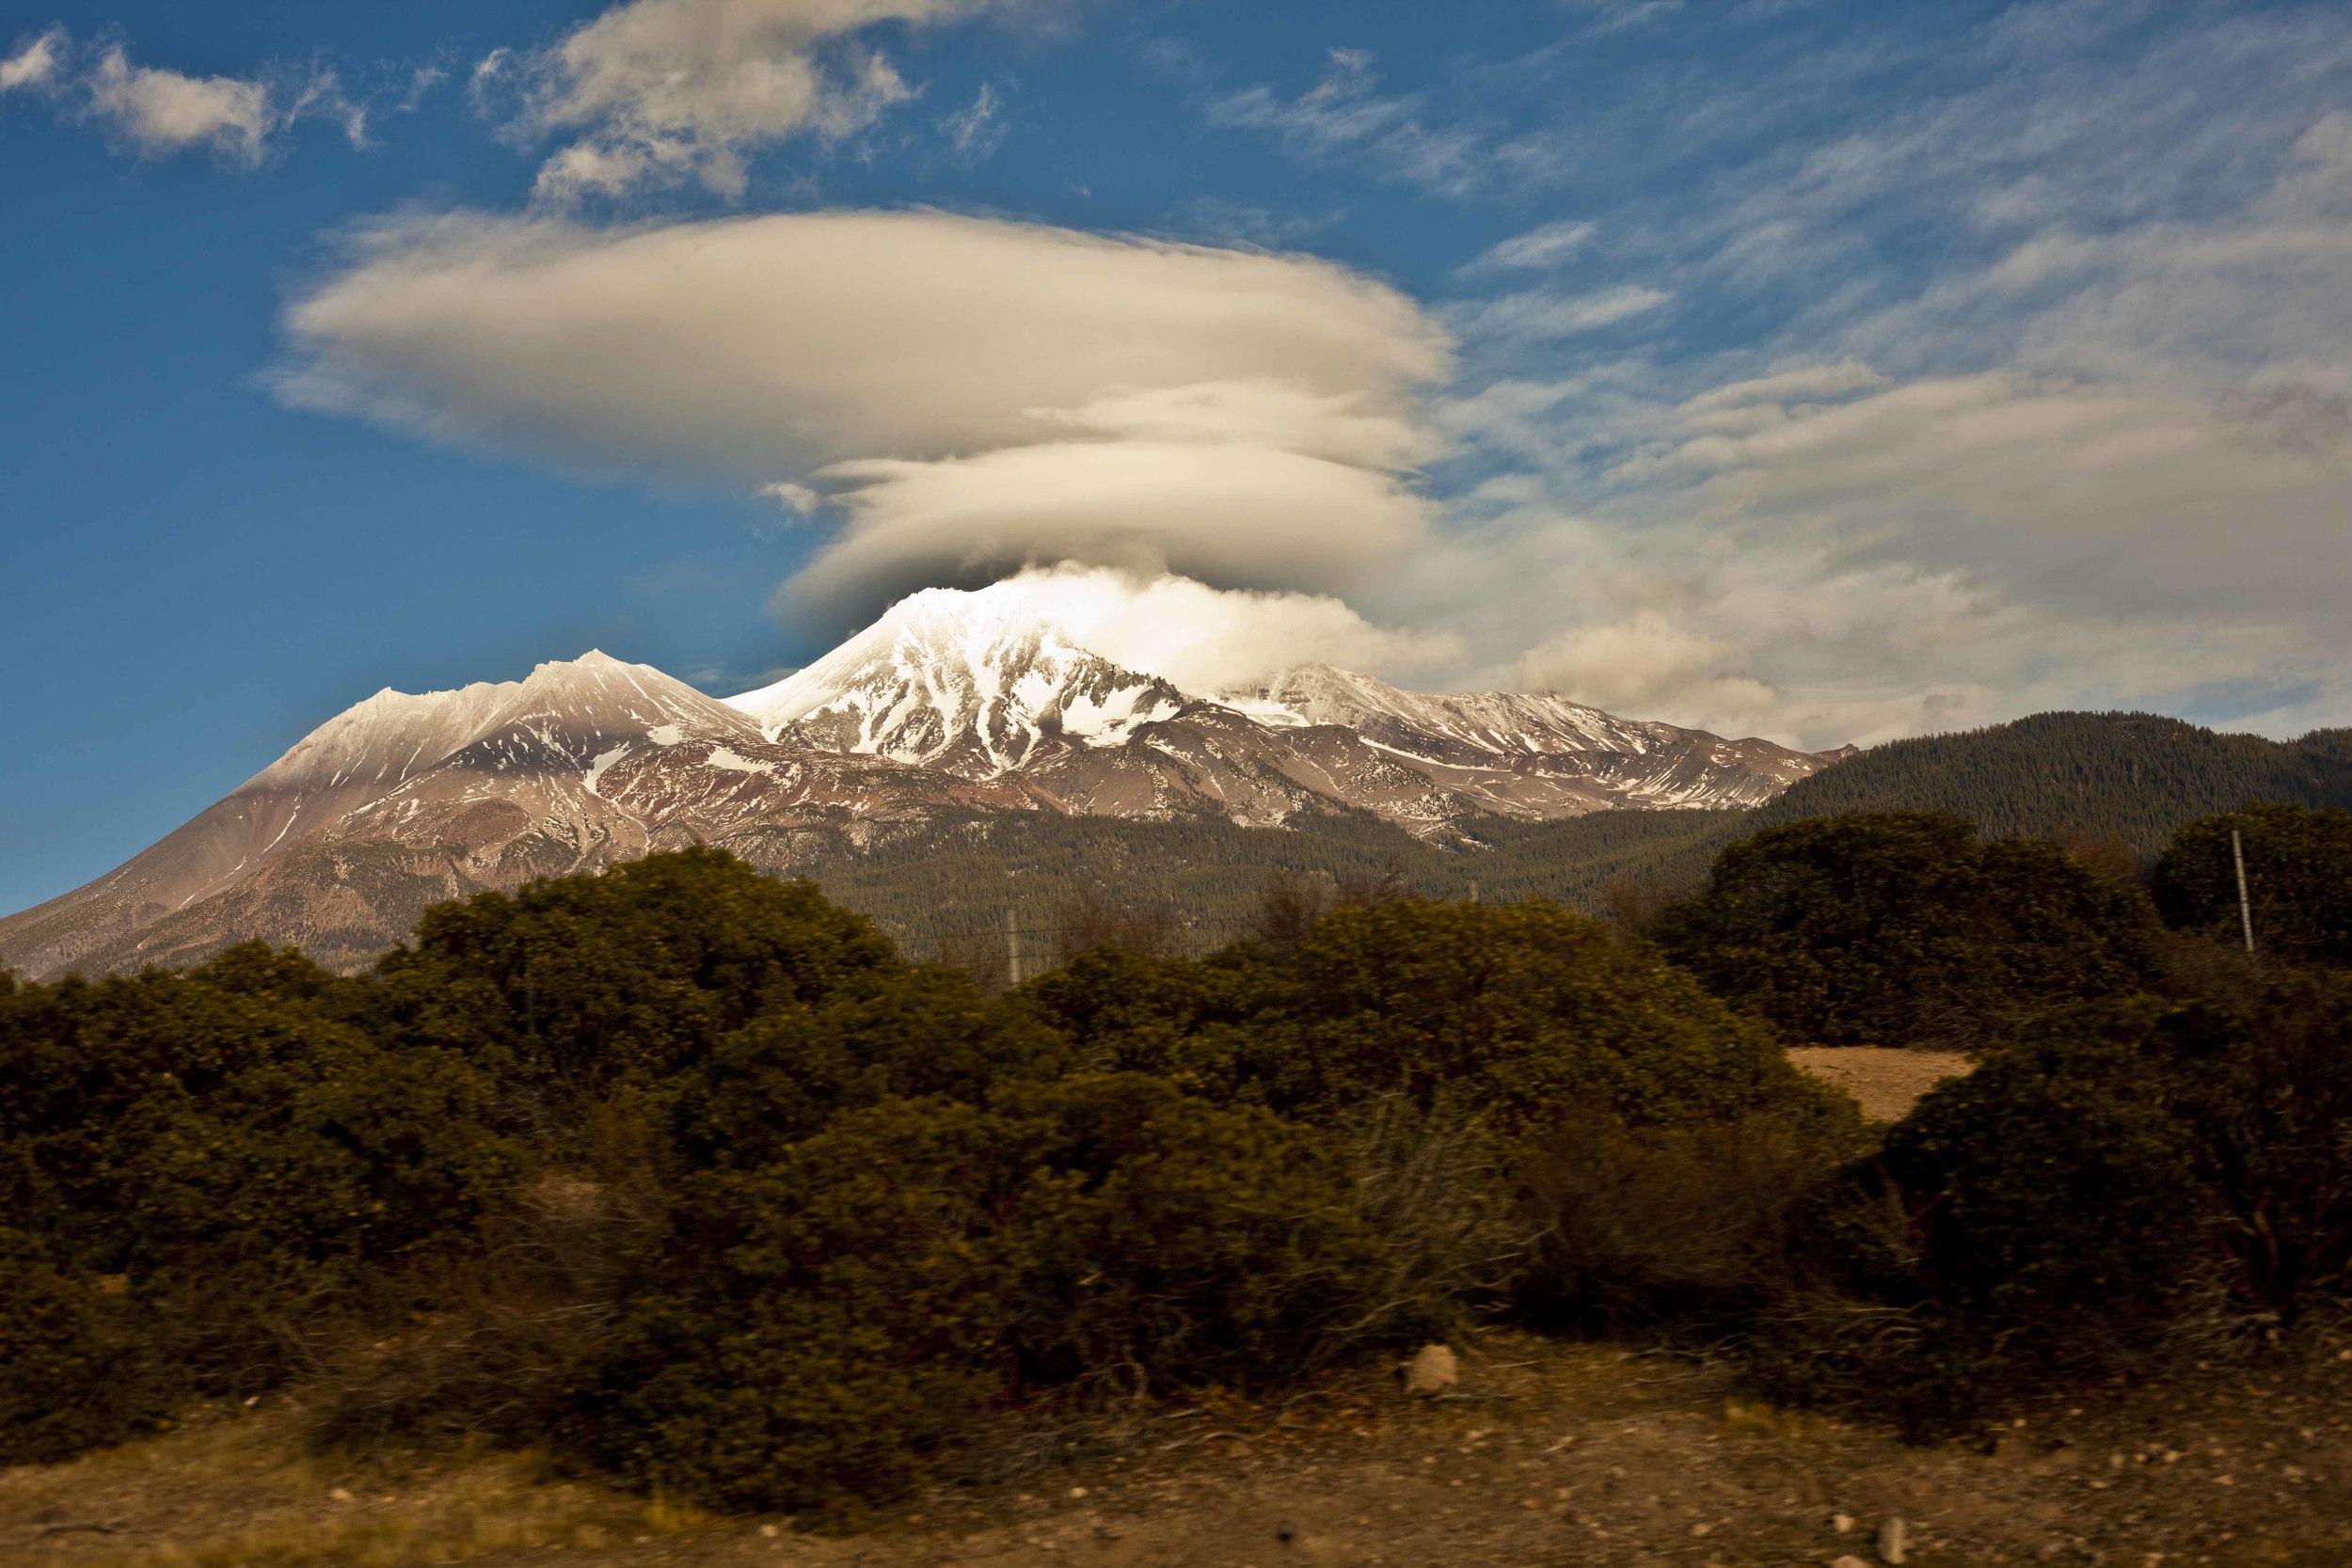 Northern Cali Mountains